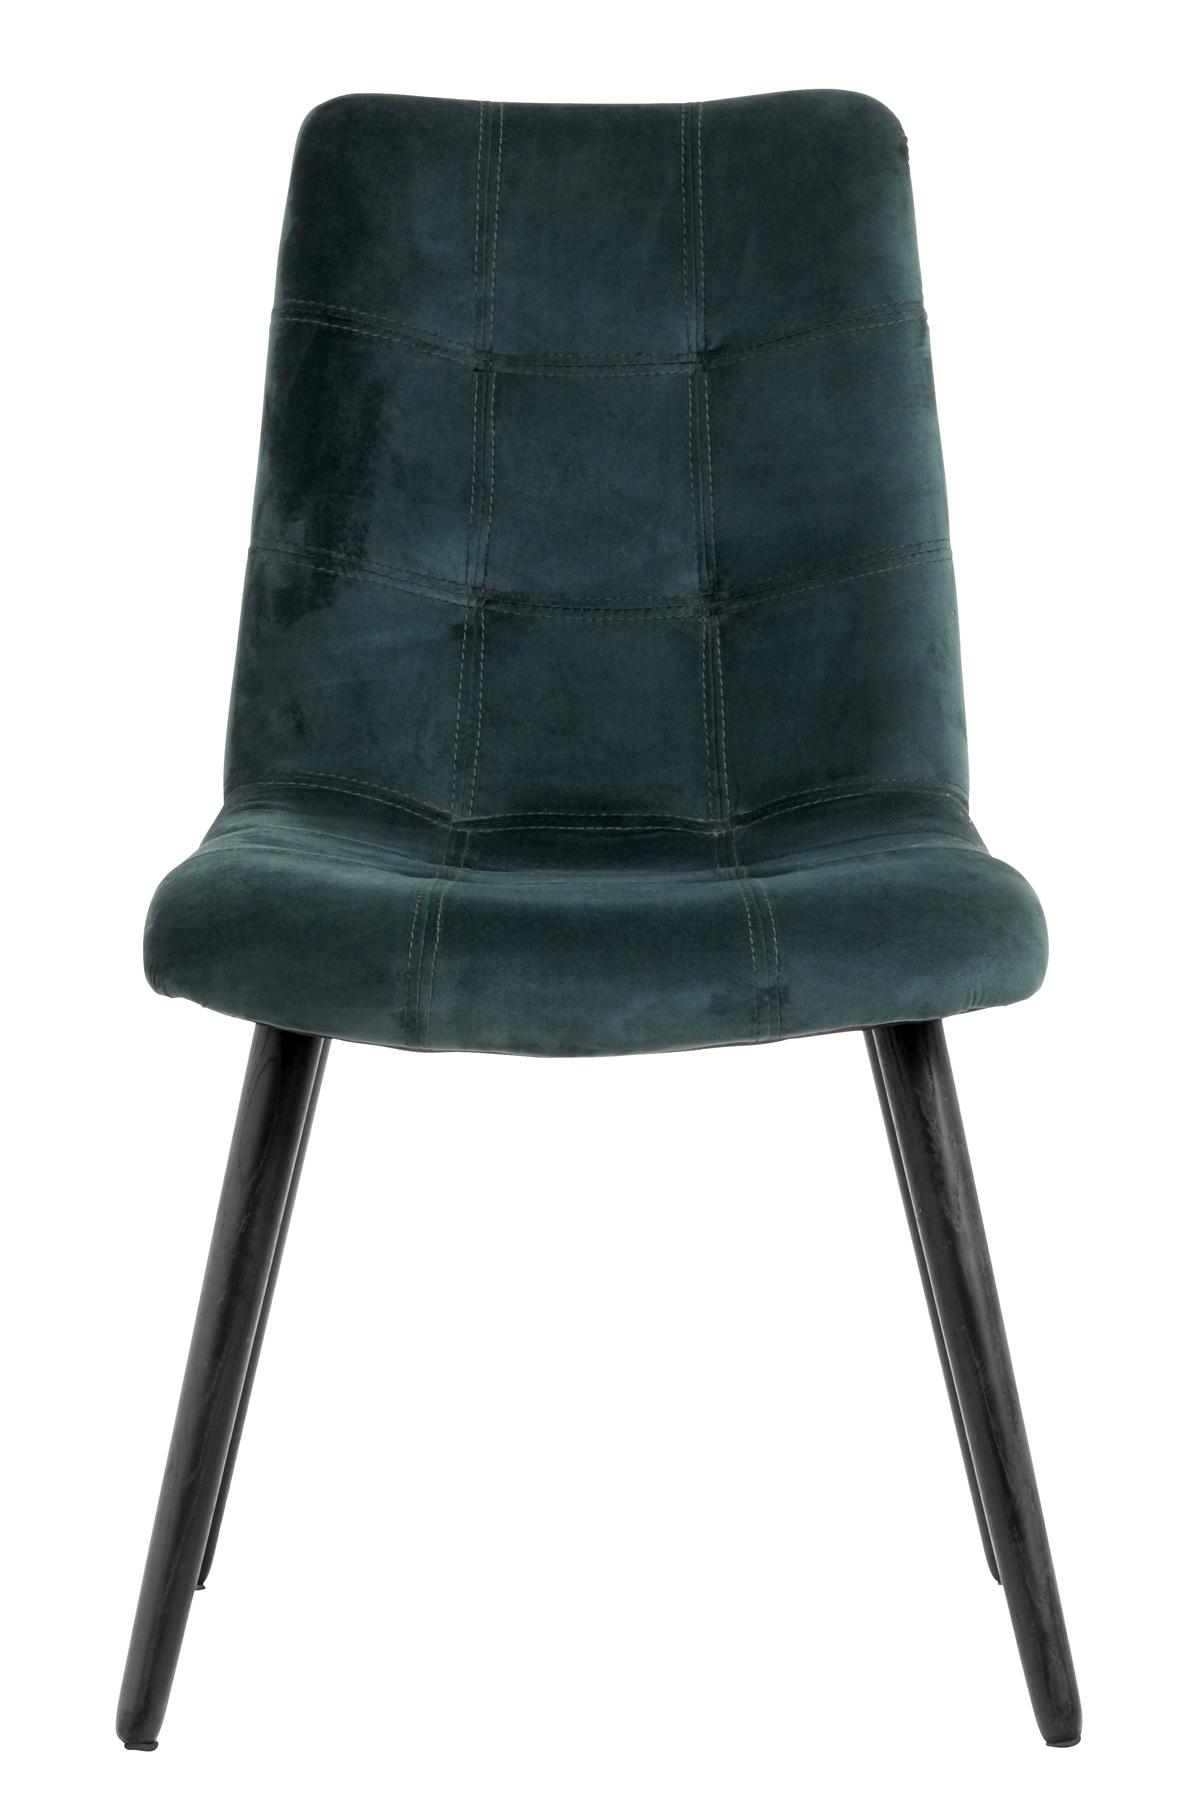 Nordal - Spisebordsstol m. velour - Grøn Nordal